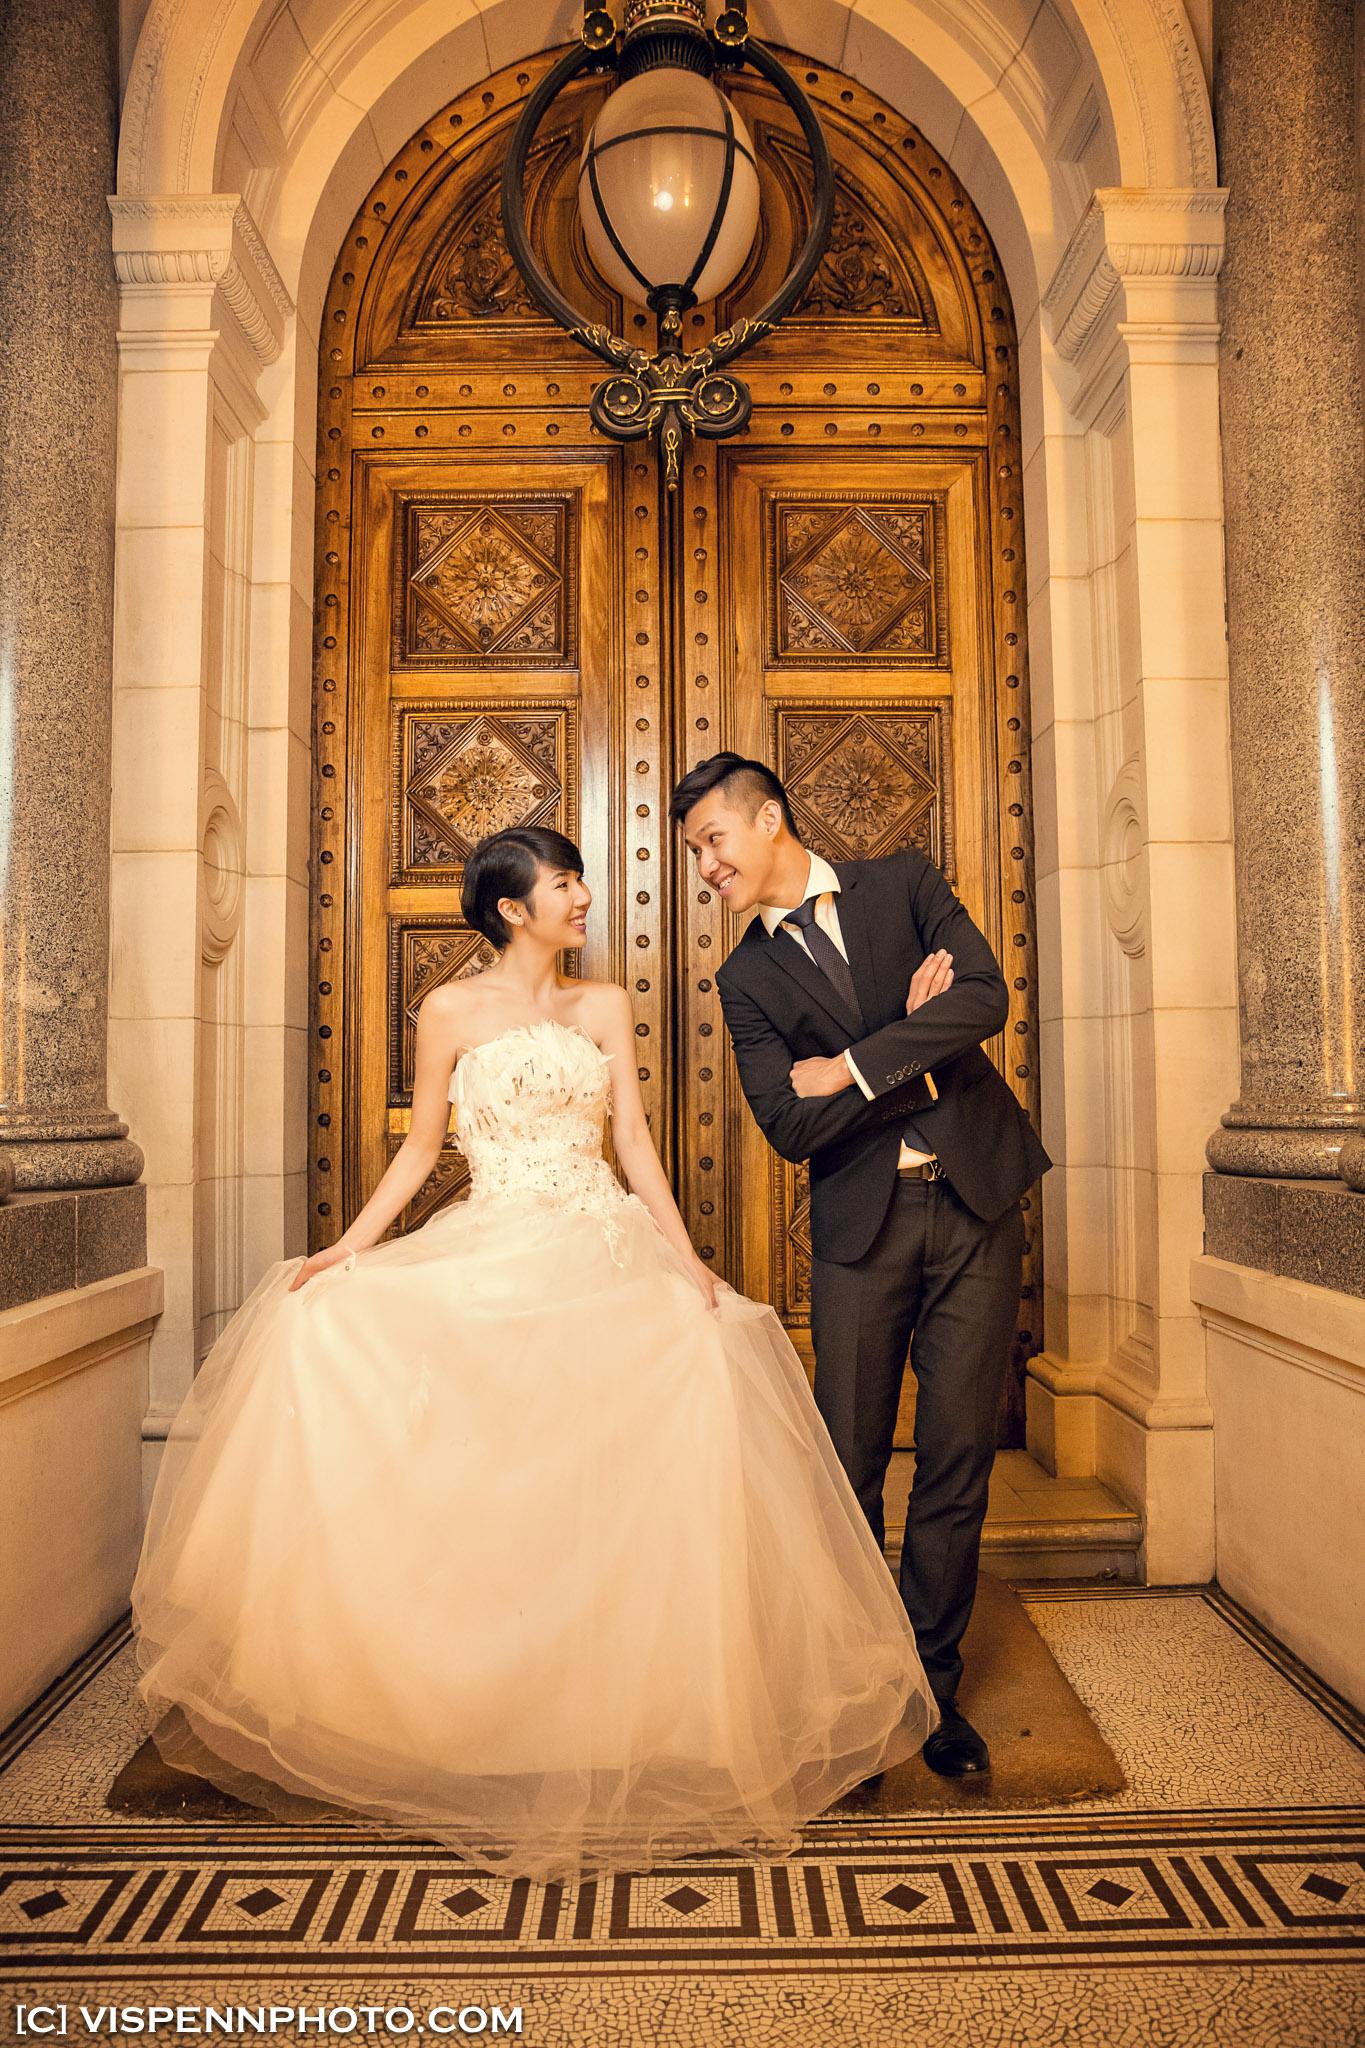 PRE WEDDING Photography Melbourne VISPENN 墨尔本 婚纱照 结婚照 婚纱摄影 Ivy PreWedding 4468